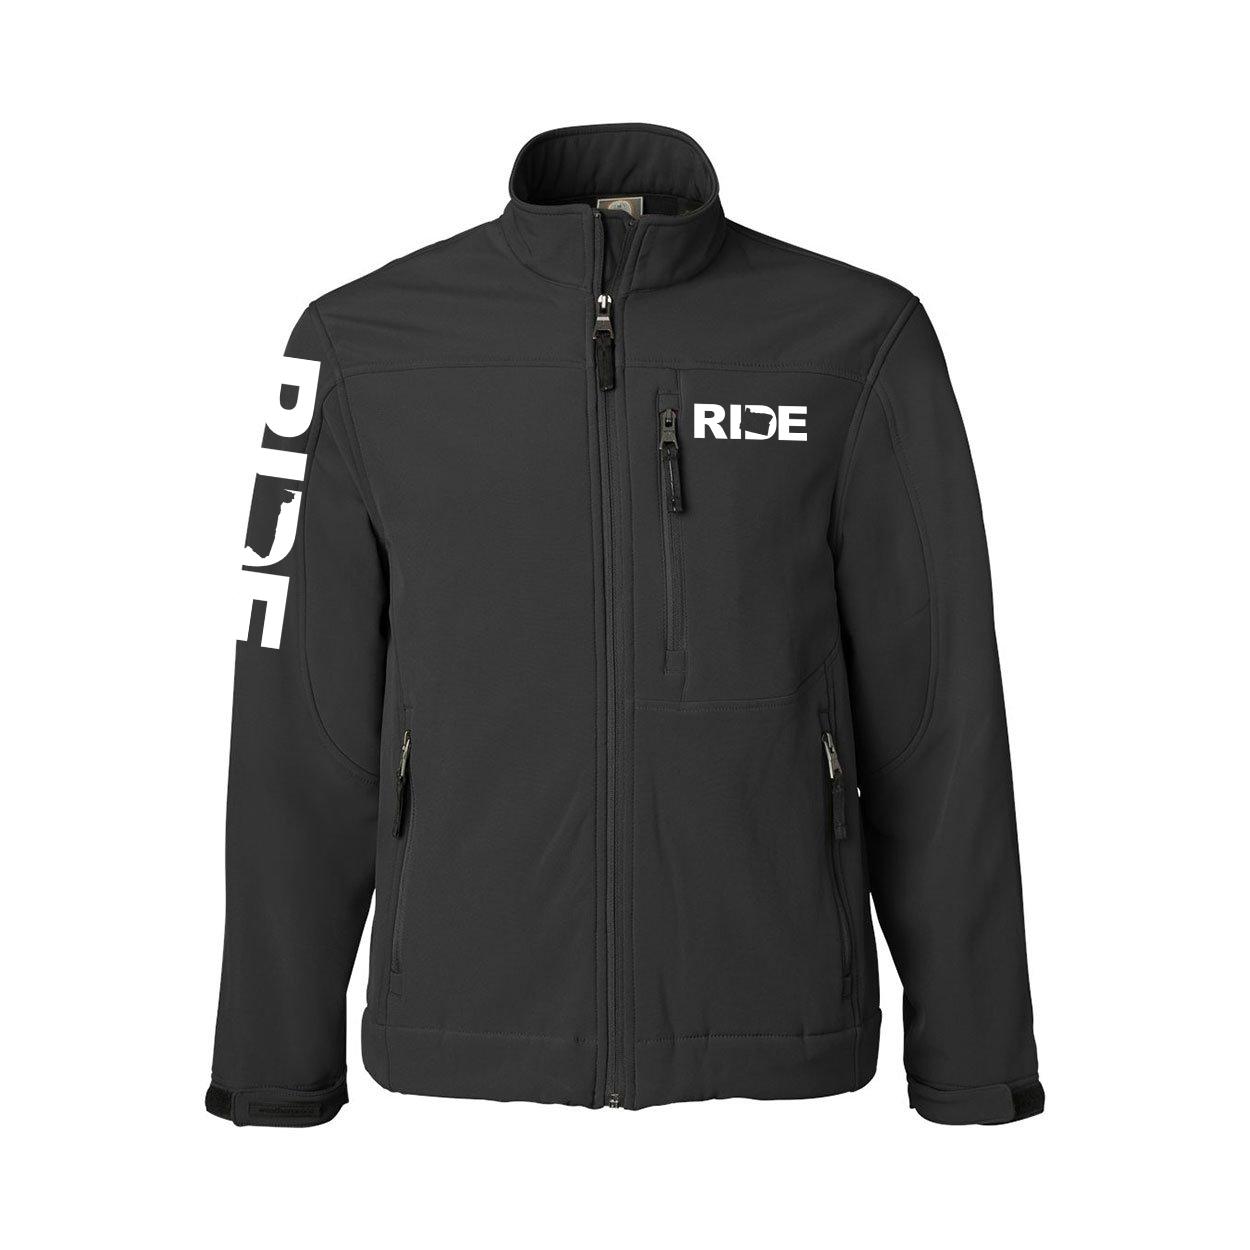 Ride Oregon Classic Soft Shell Weatherproof Jacket (White Logo)